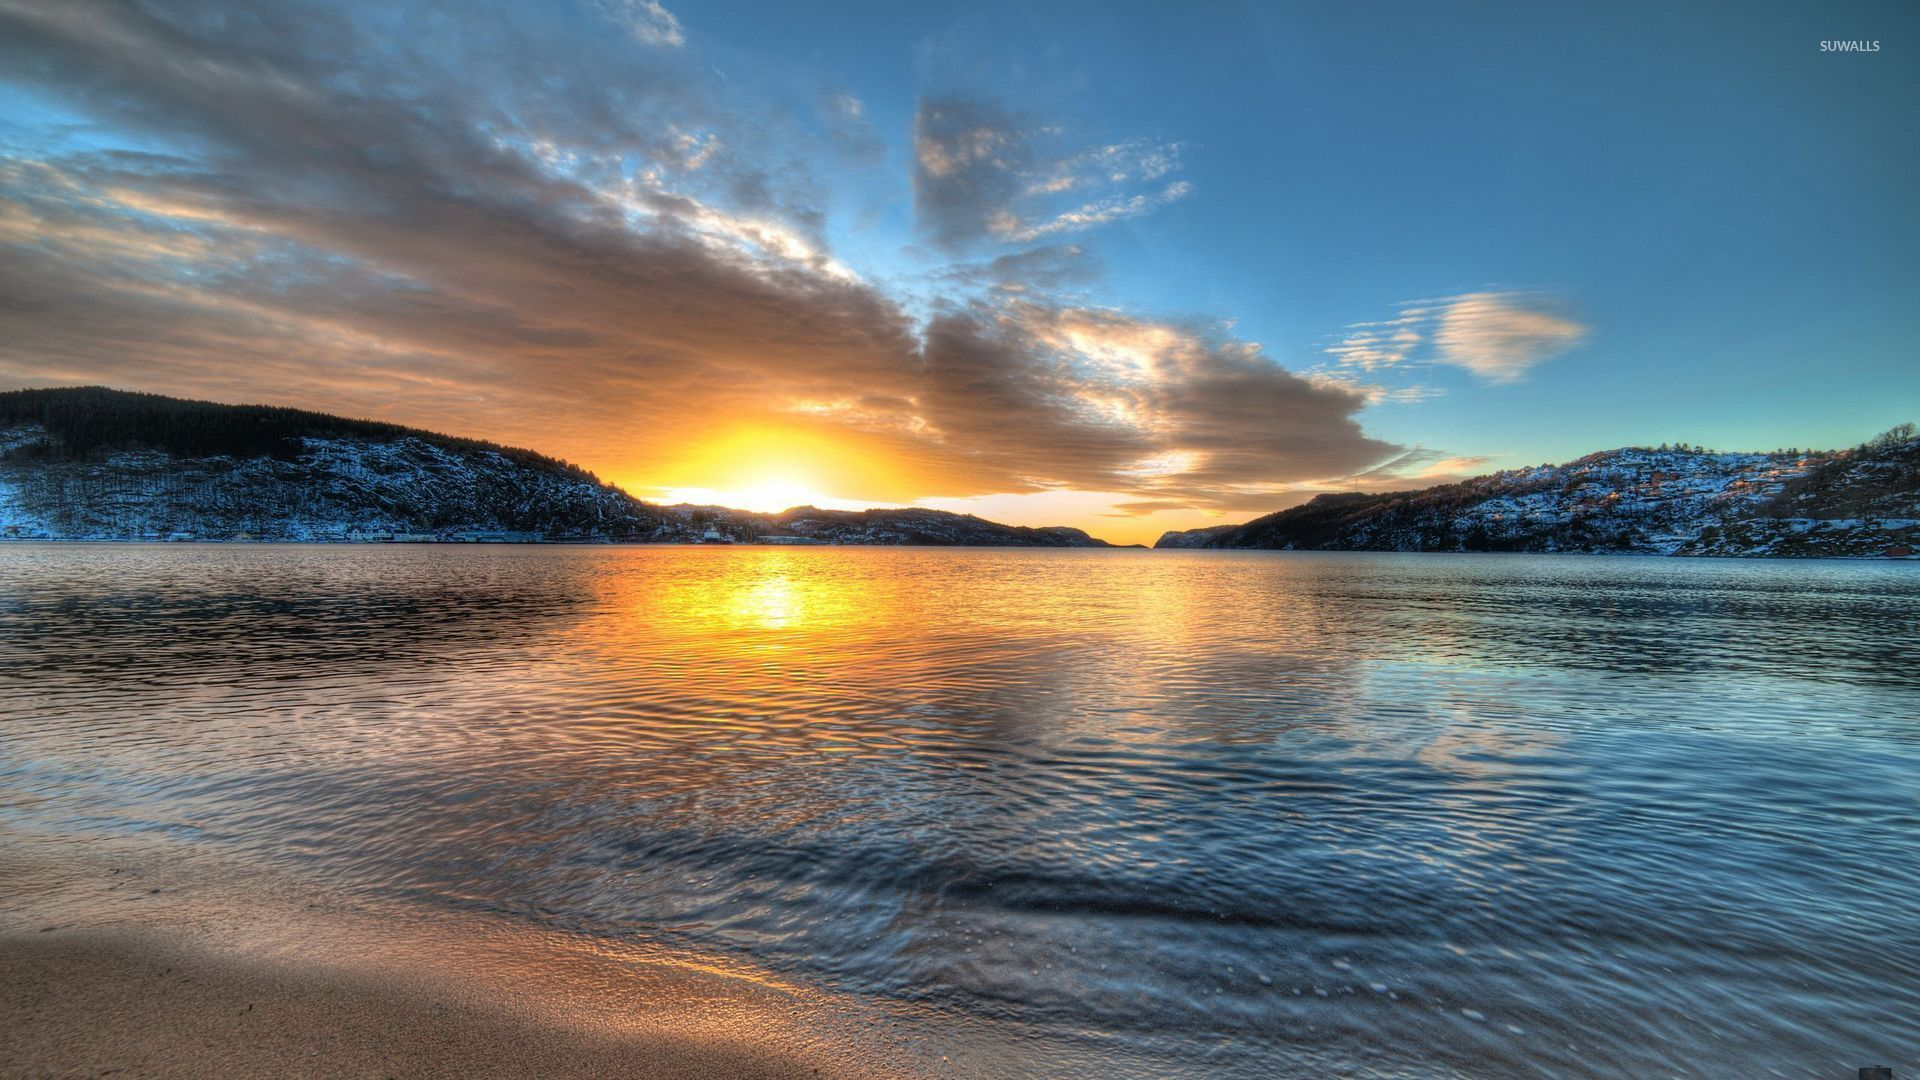 golden sunset on the